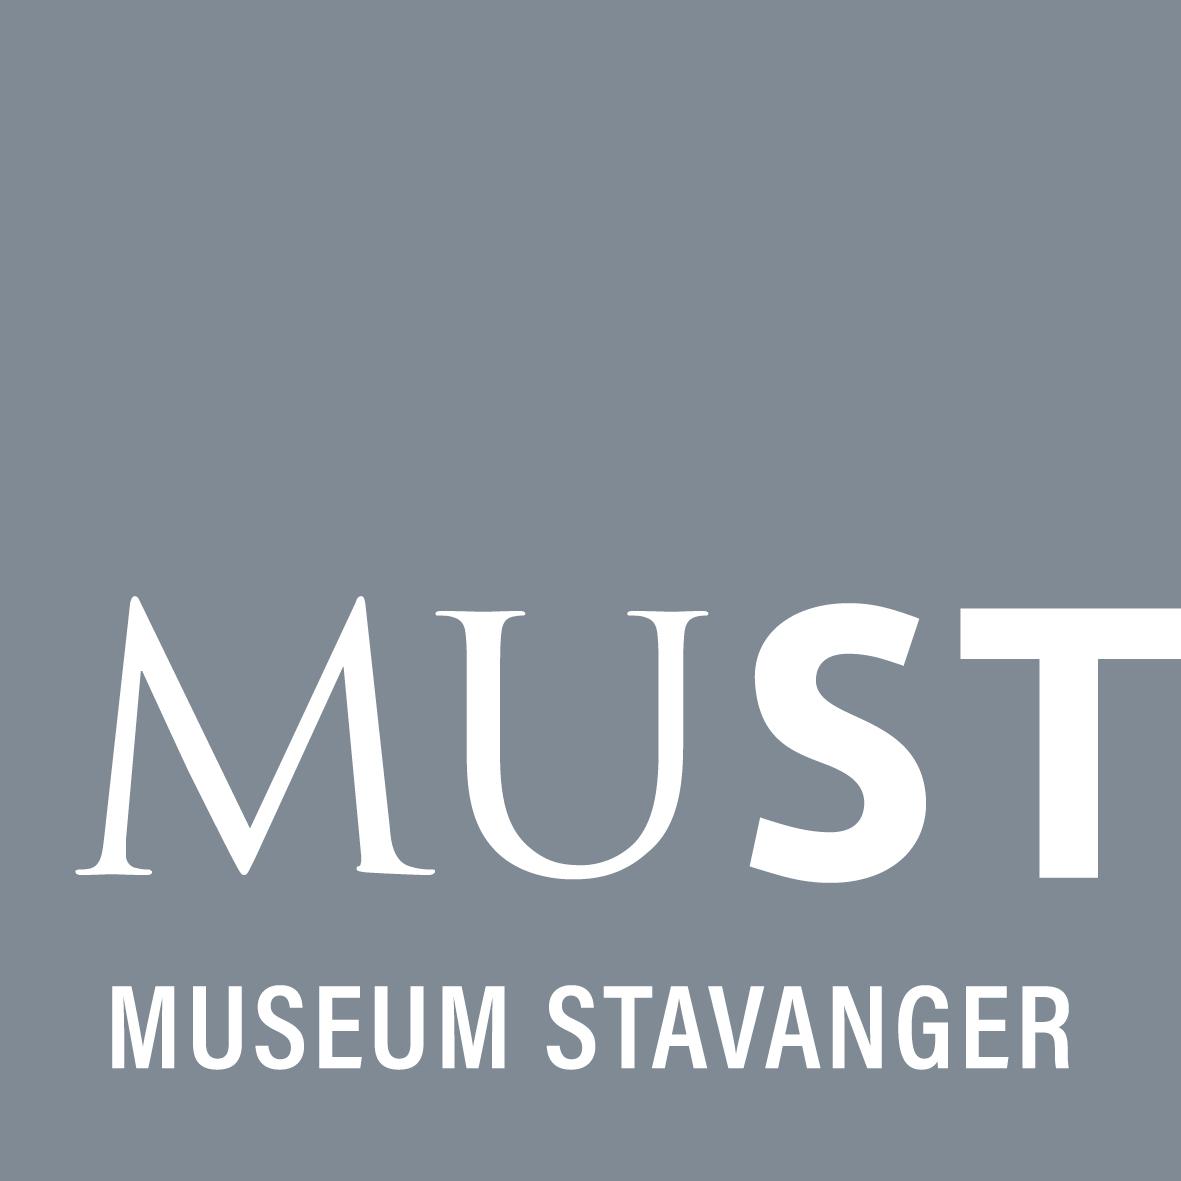 Museum Stavanger (MUST)